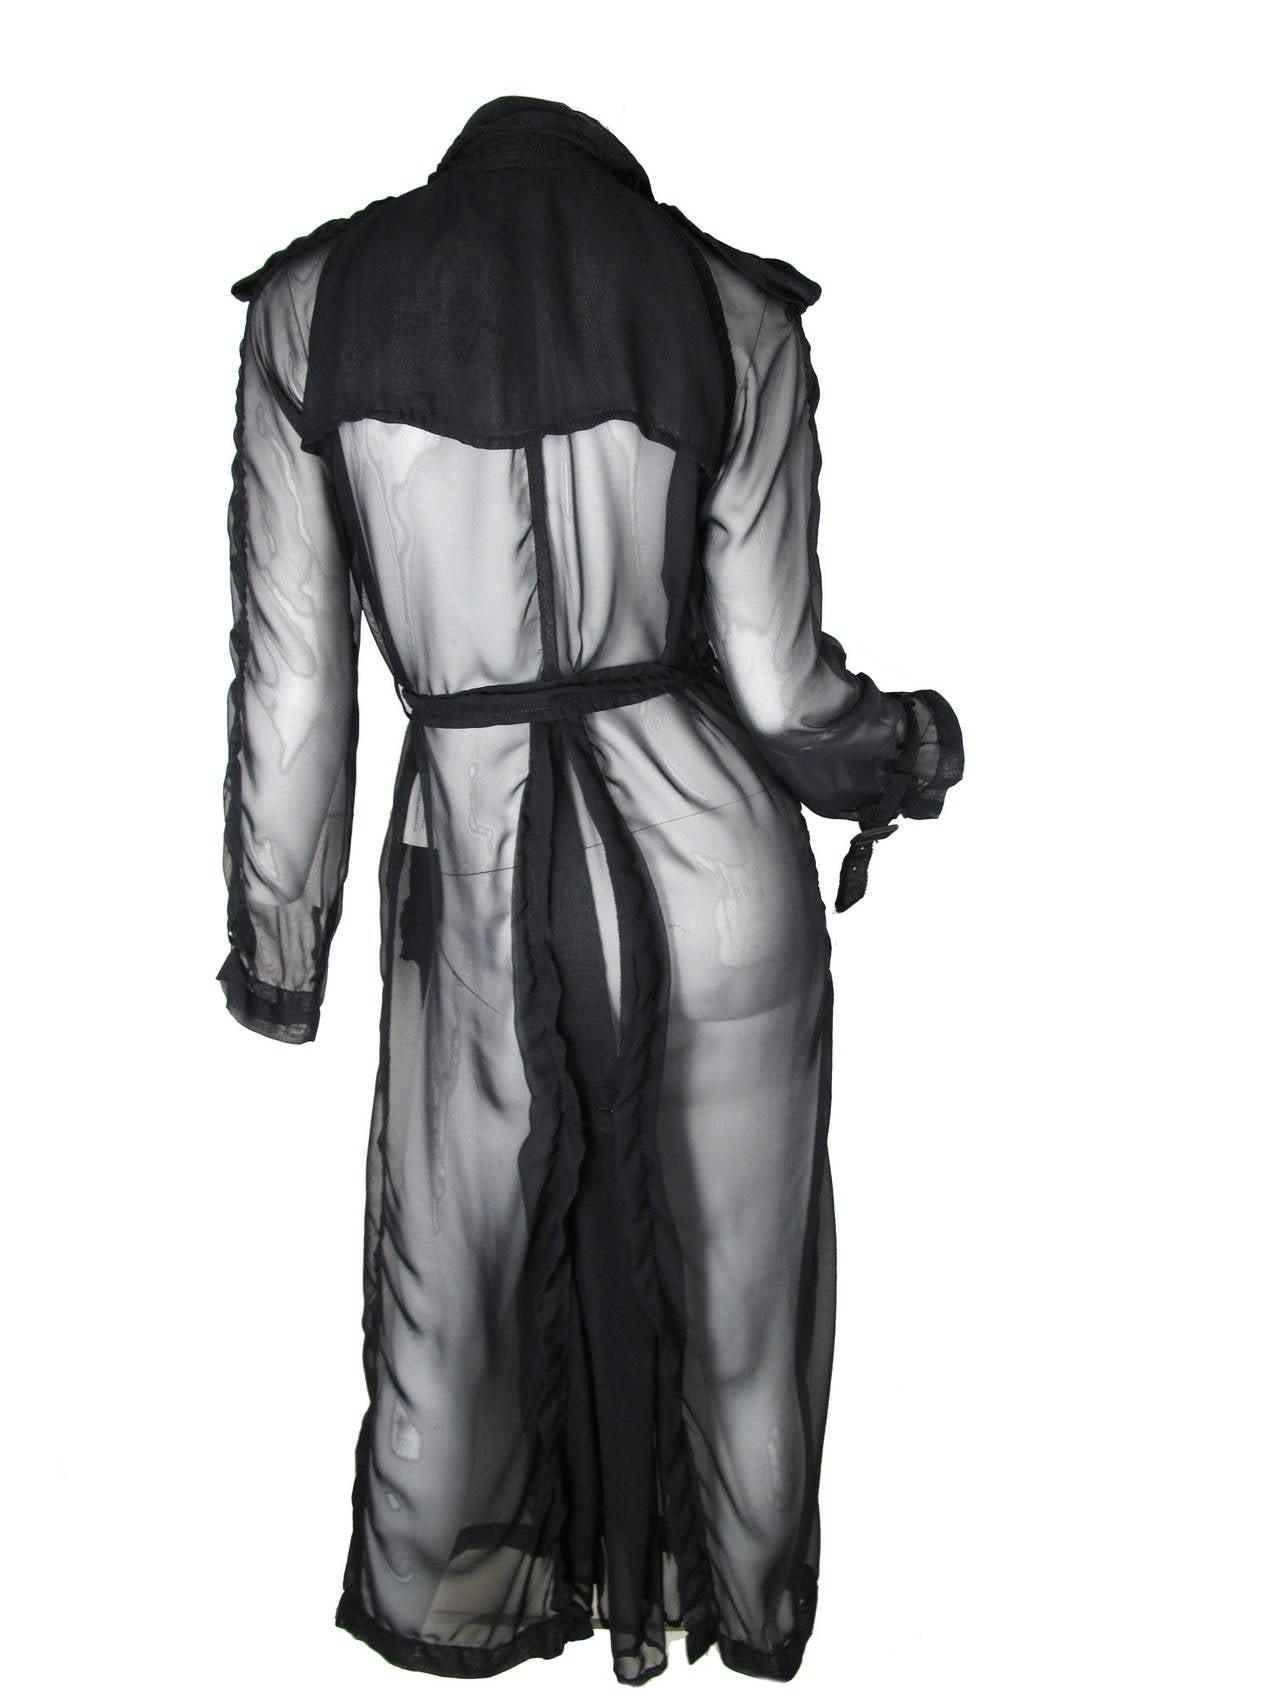 2009 Comme des Garcons Sheer Trench Coat 3